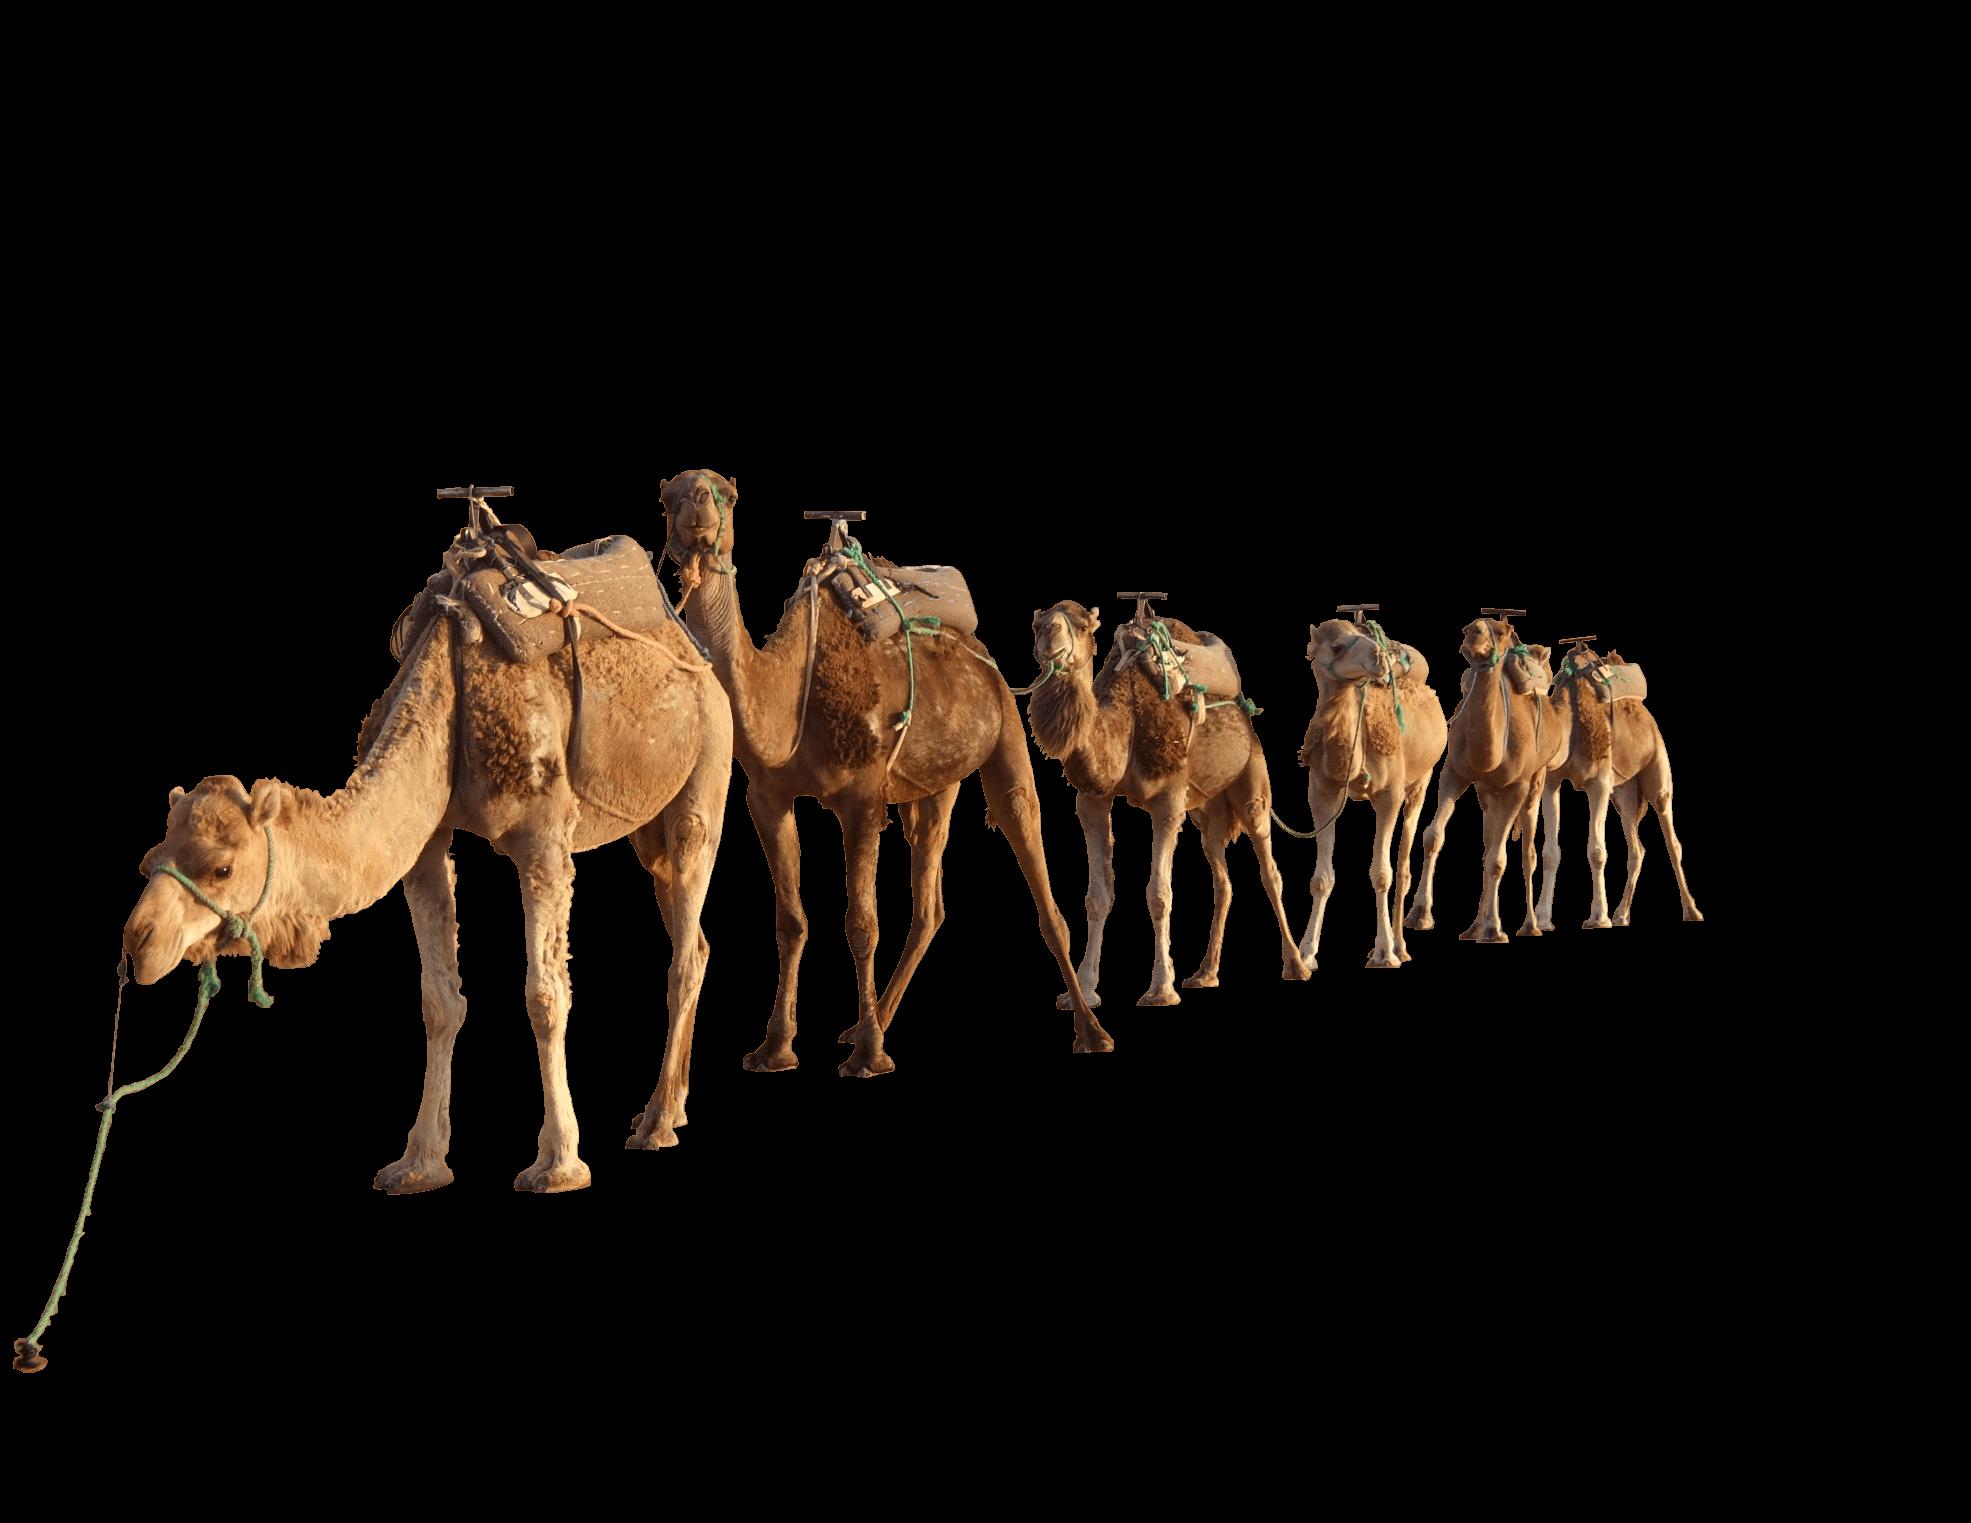 Camel PNG - 21102